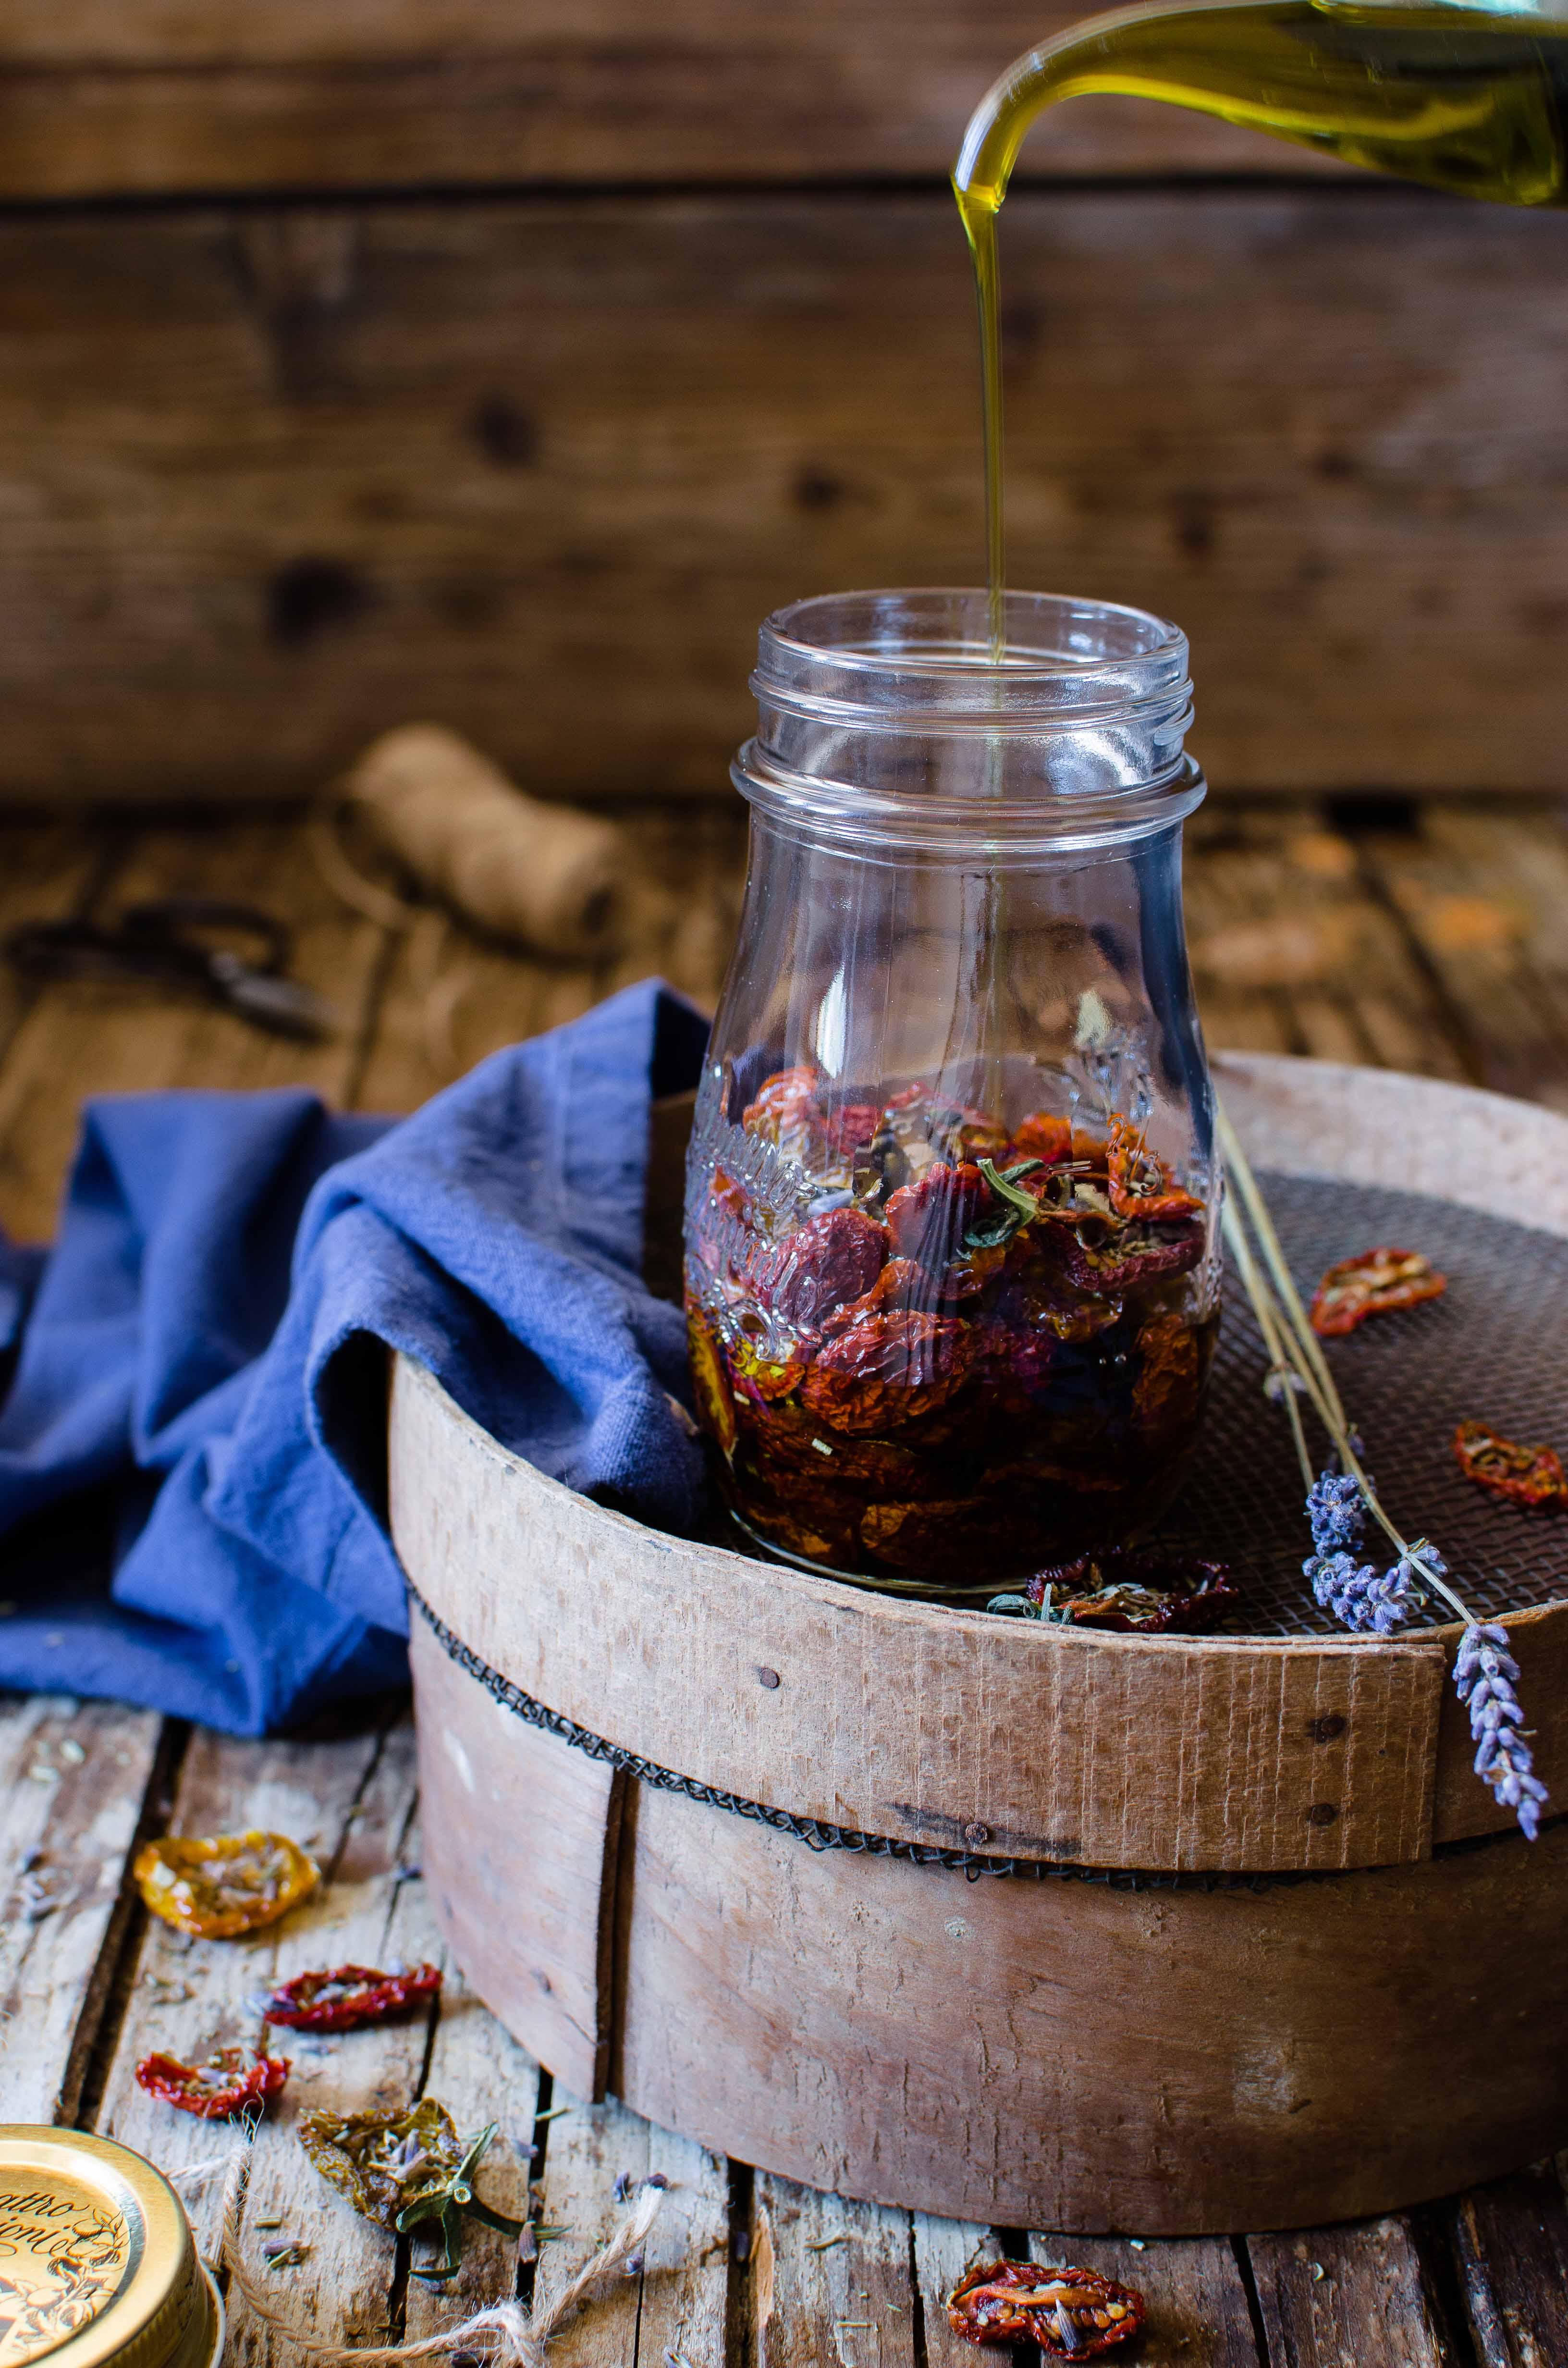 Pomodorini-confit-lavanda-olio Pomodori confit alle erbe provenzali